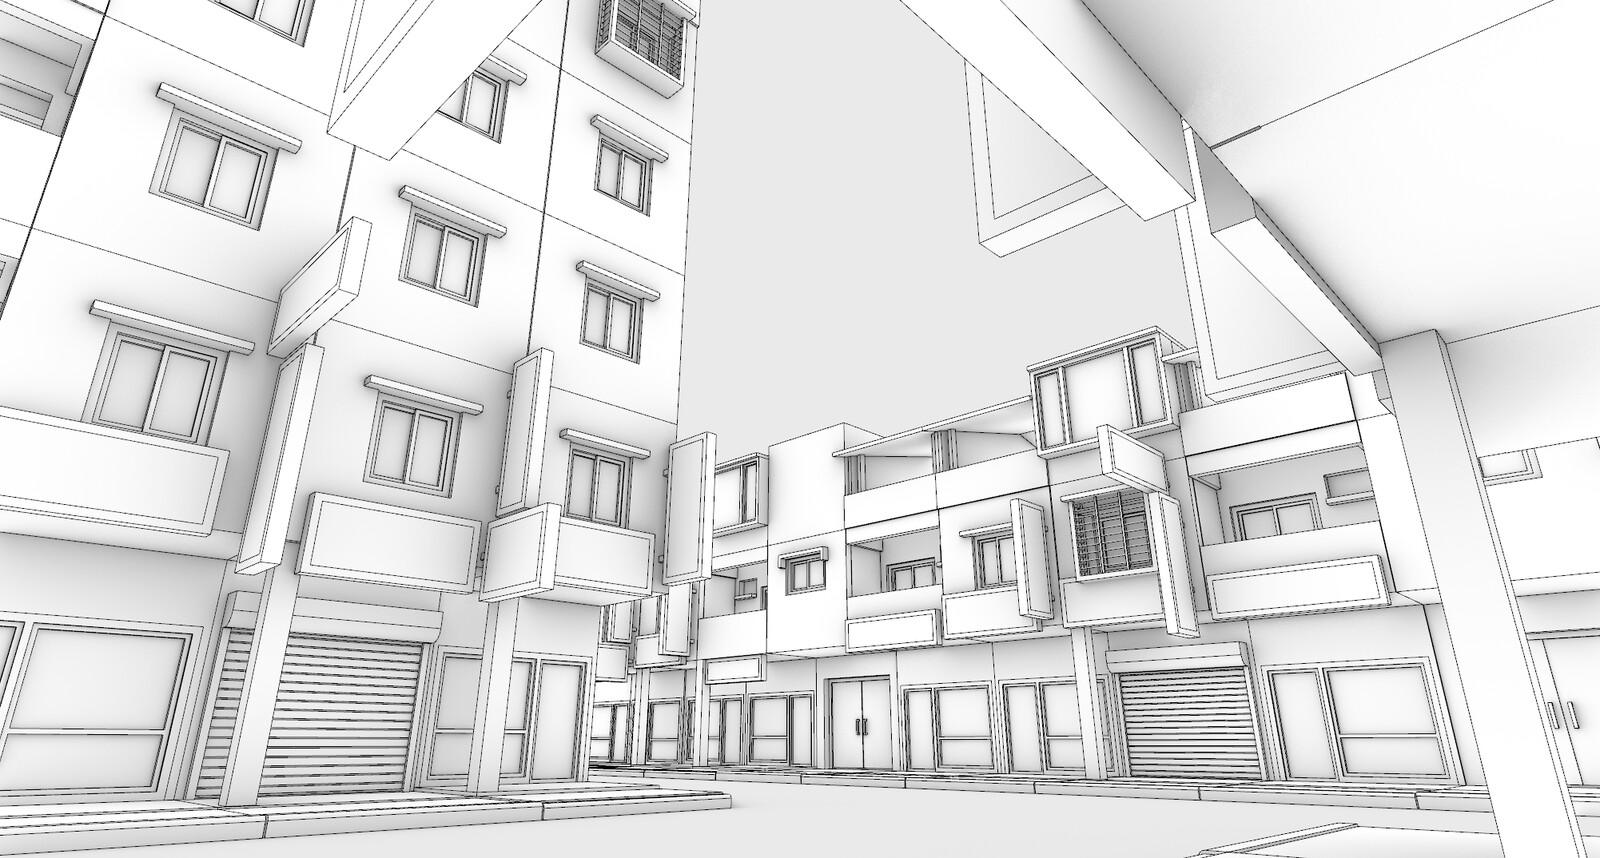 Street House Builder|2021-07